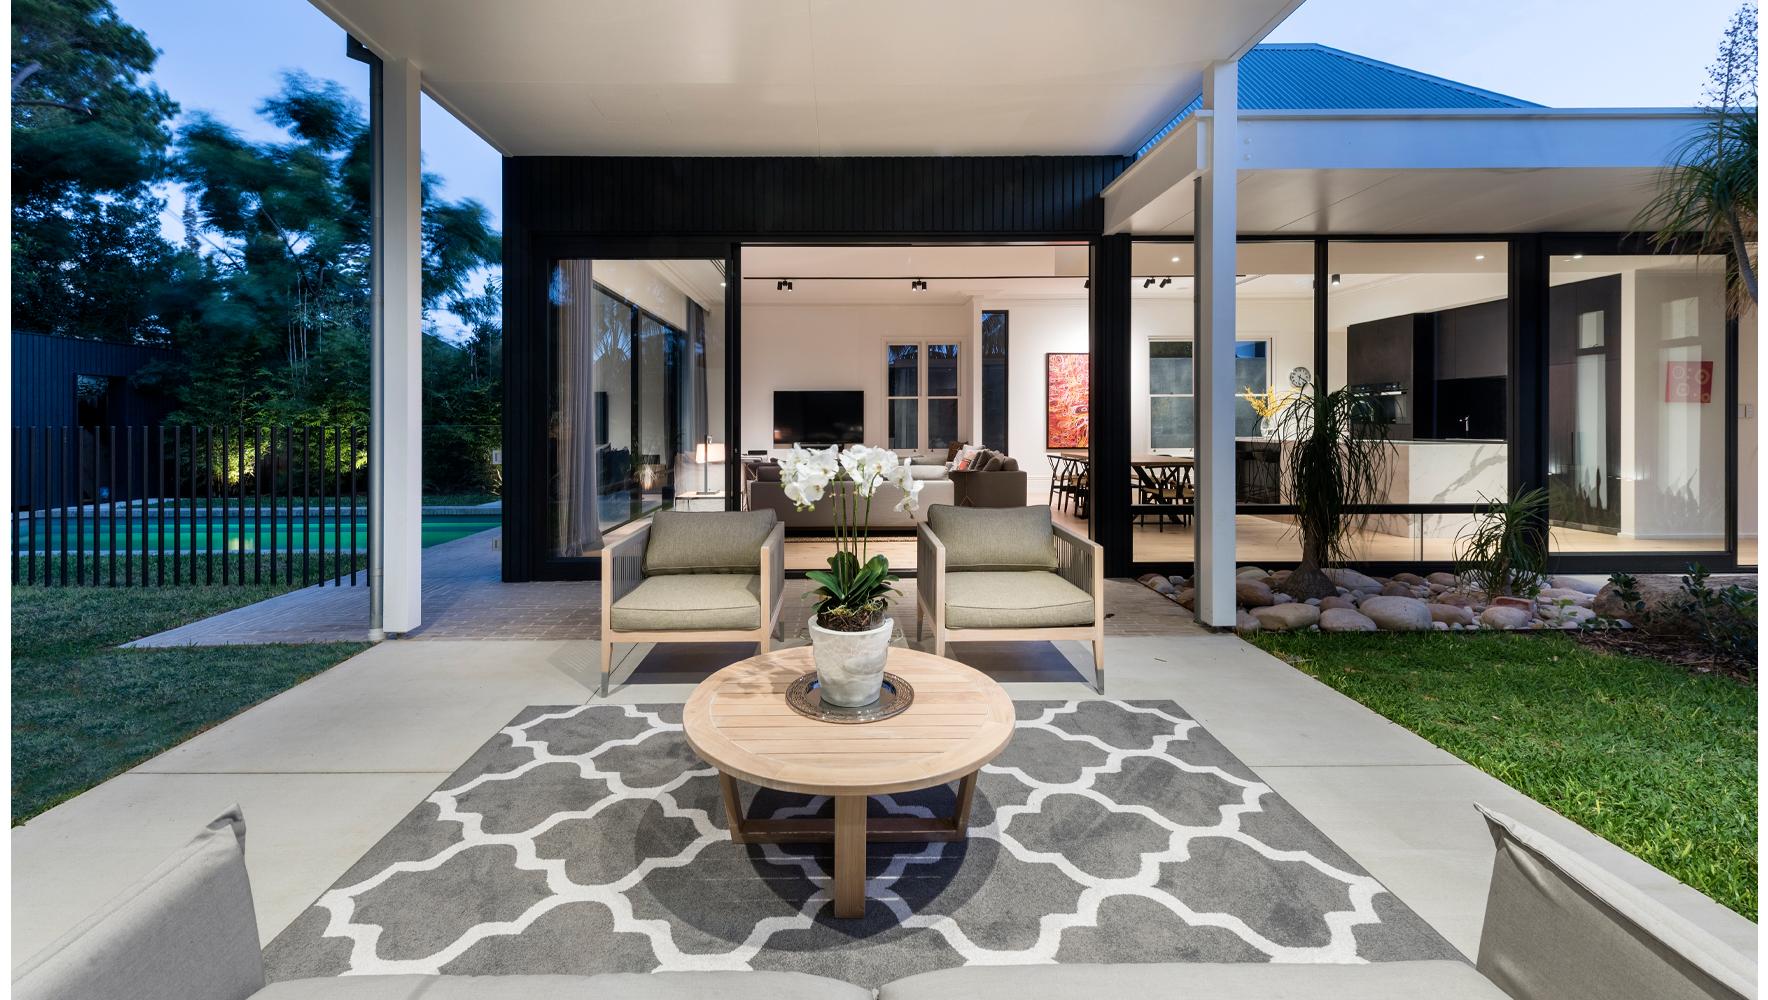 maek-luxury-home-design-inspiration-mosmanpark-27m-gallery-13.jpg